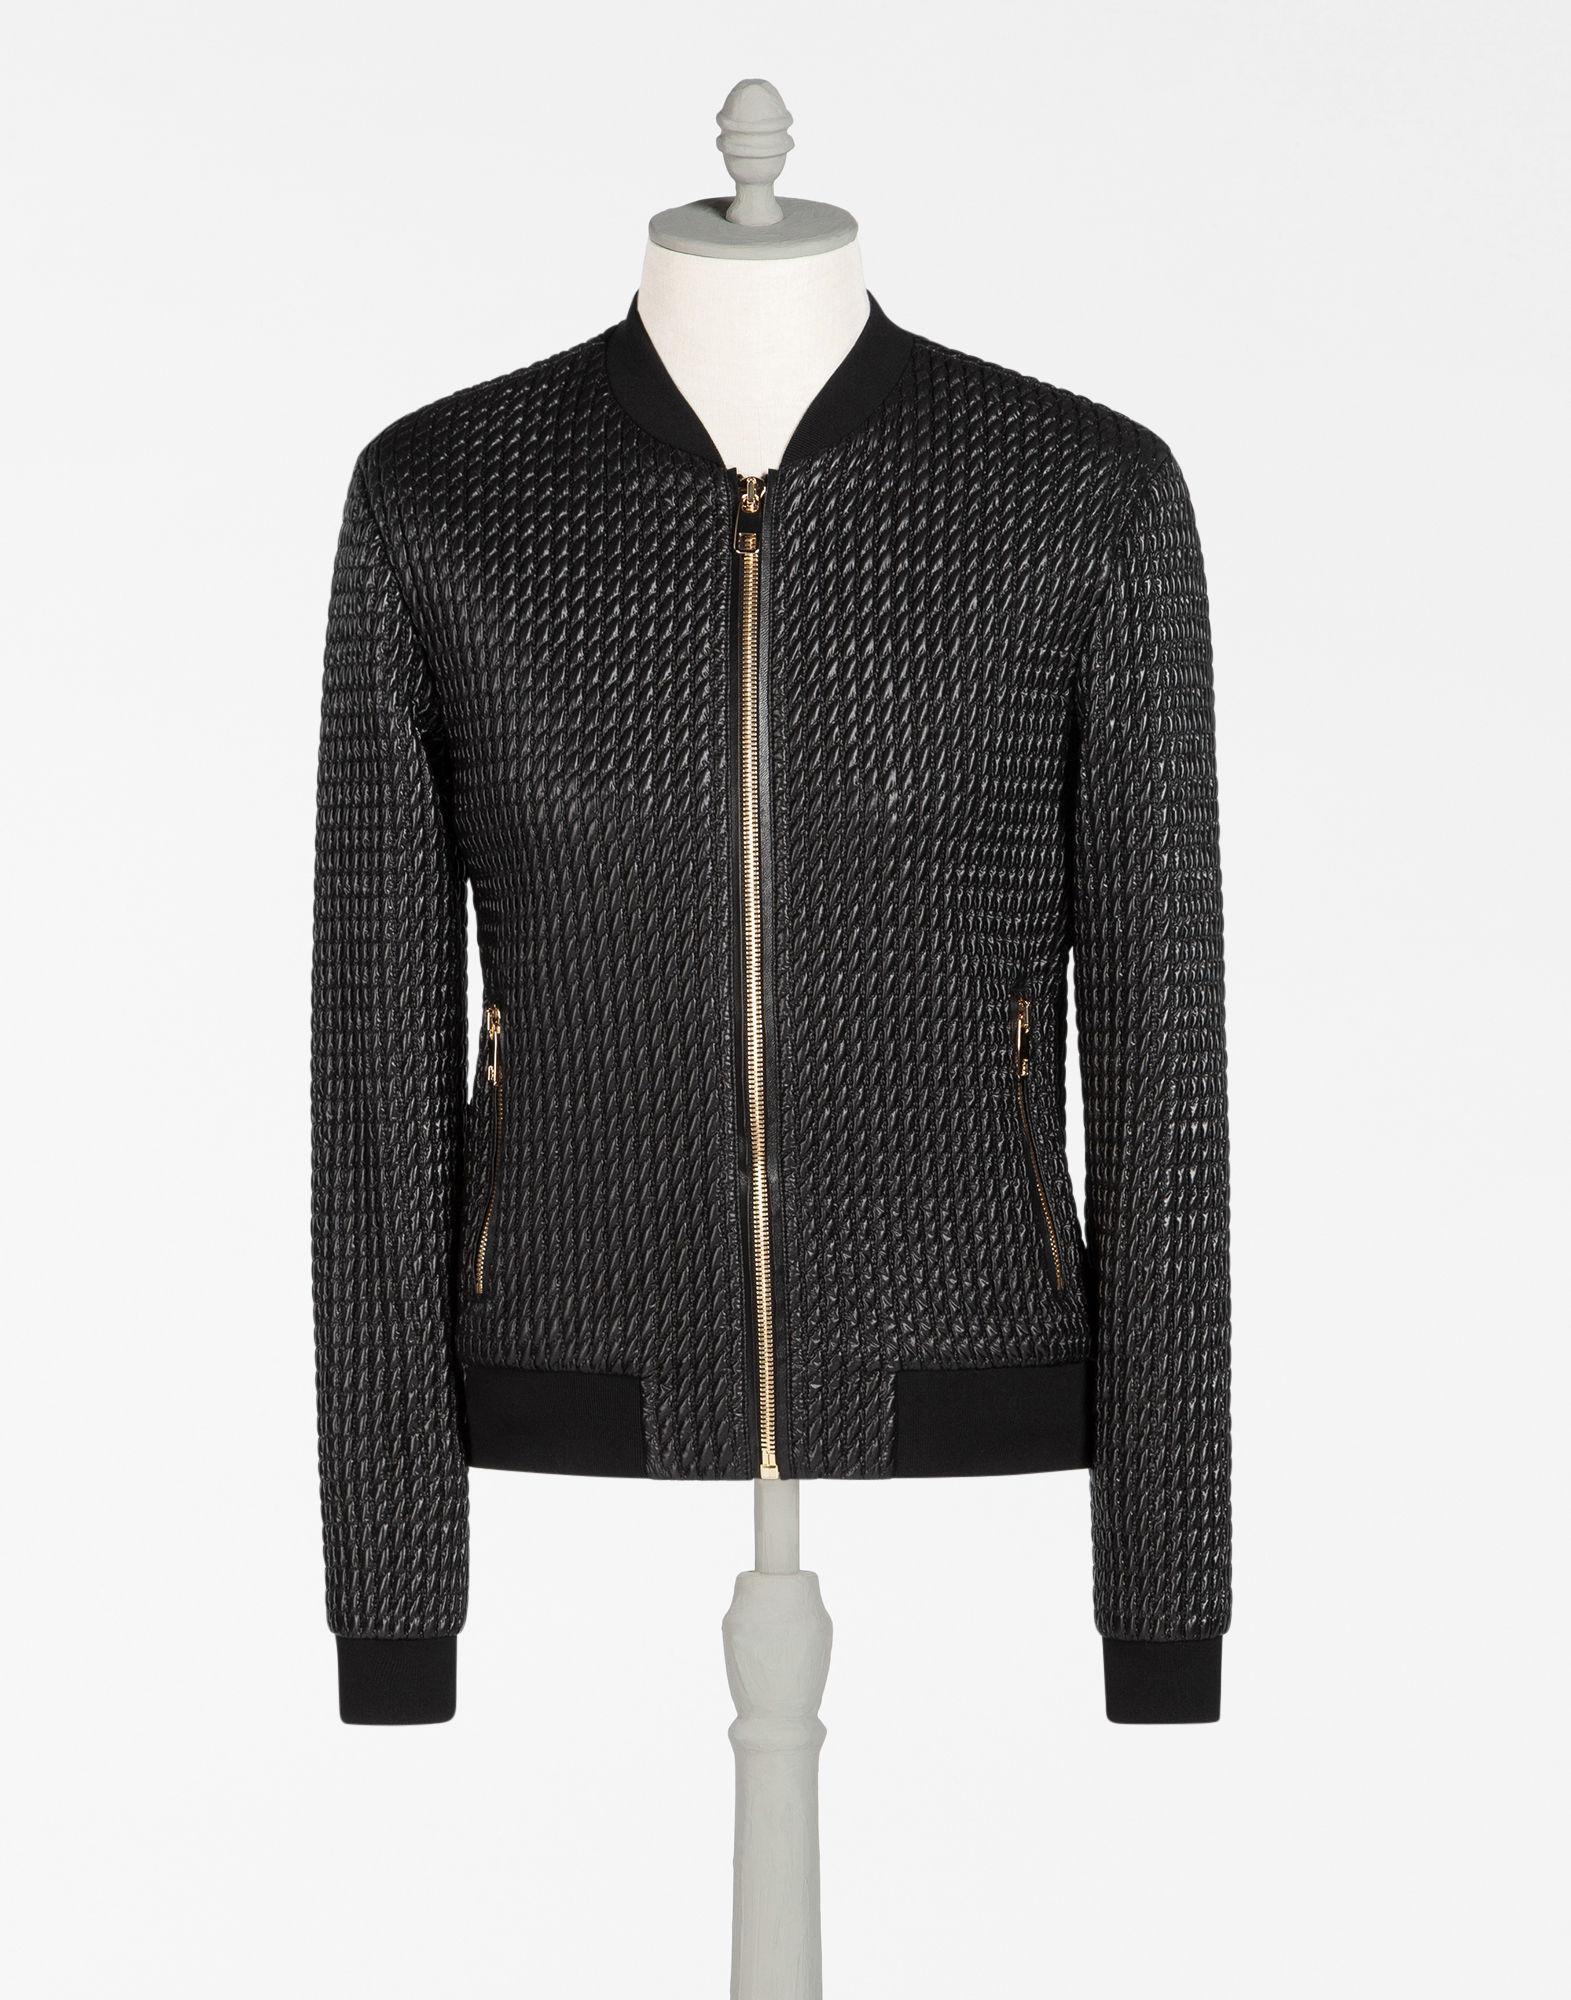 Dolce Gabbana Quilted Nylon Bomber Jacket Black Modesens